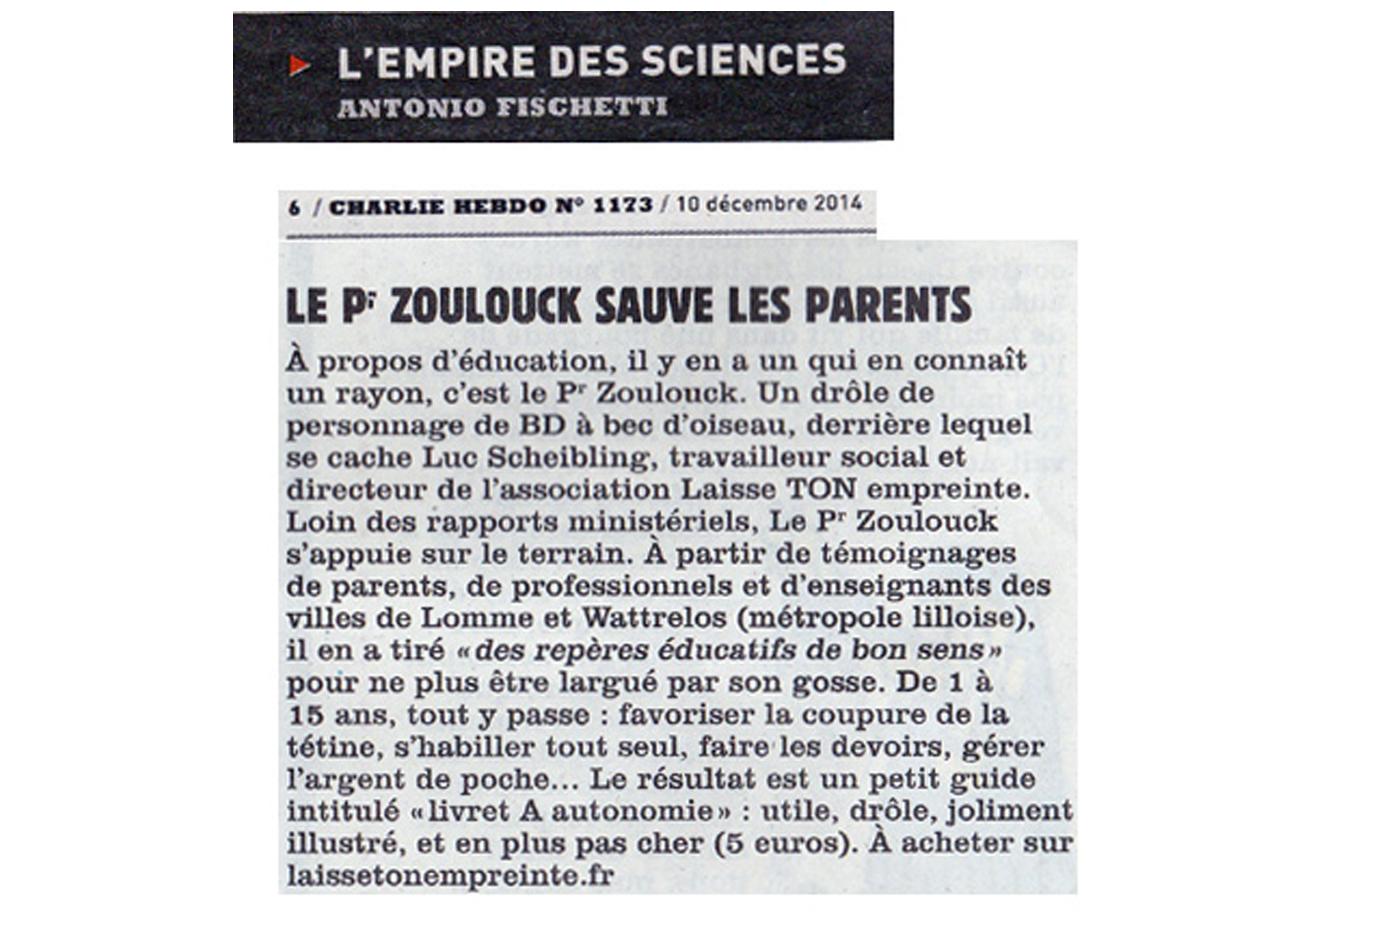 4 LivretA-Autonomie_CharlieHebdo 10déc2014